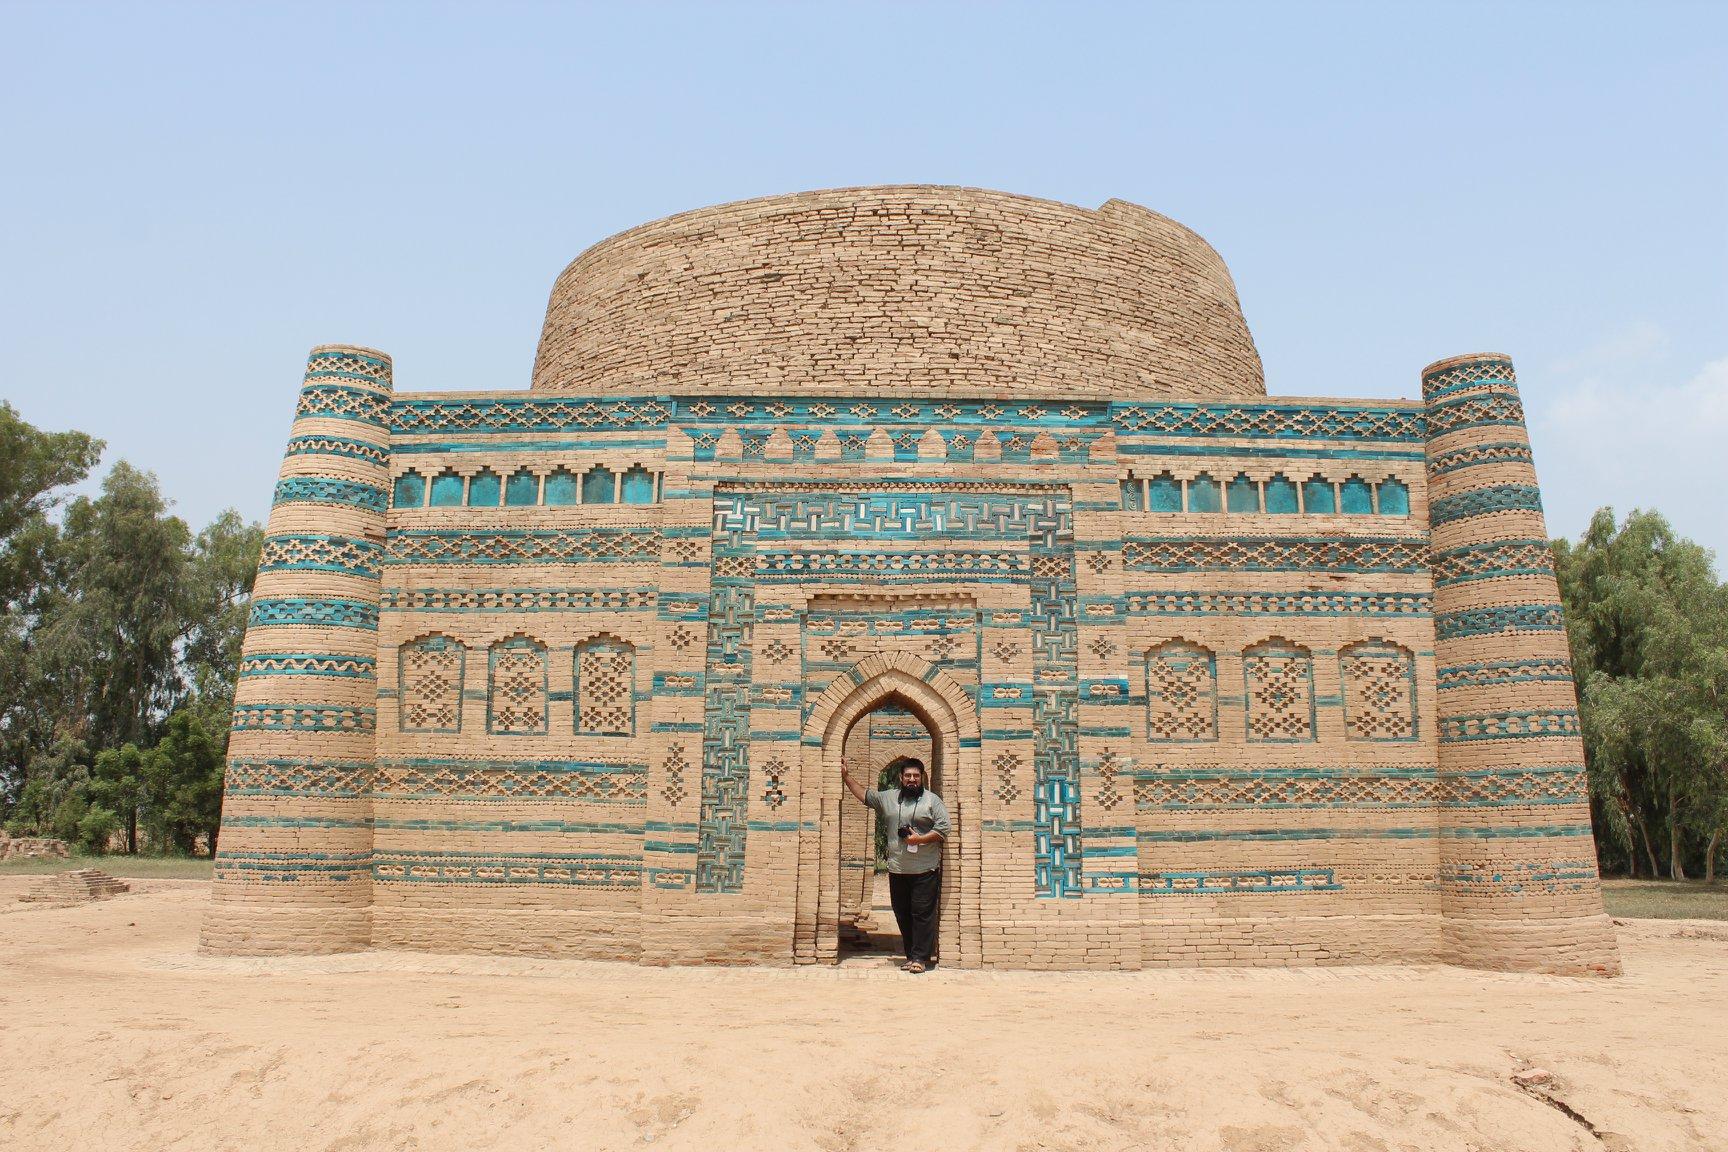 Dome, Lal Mahra tombs